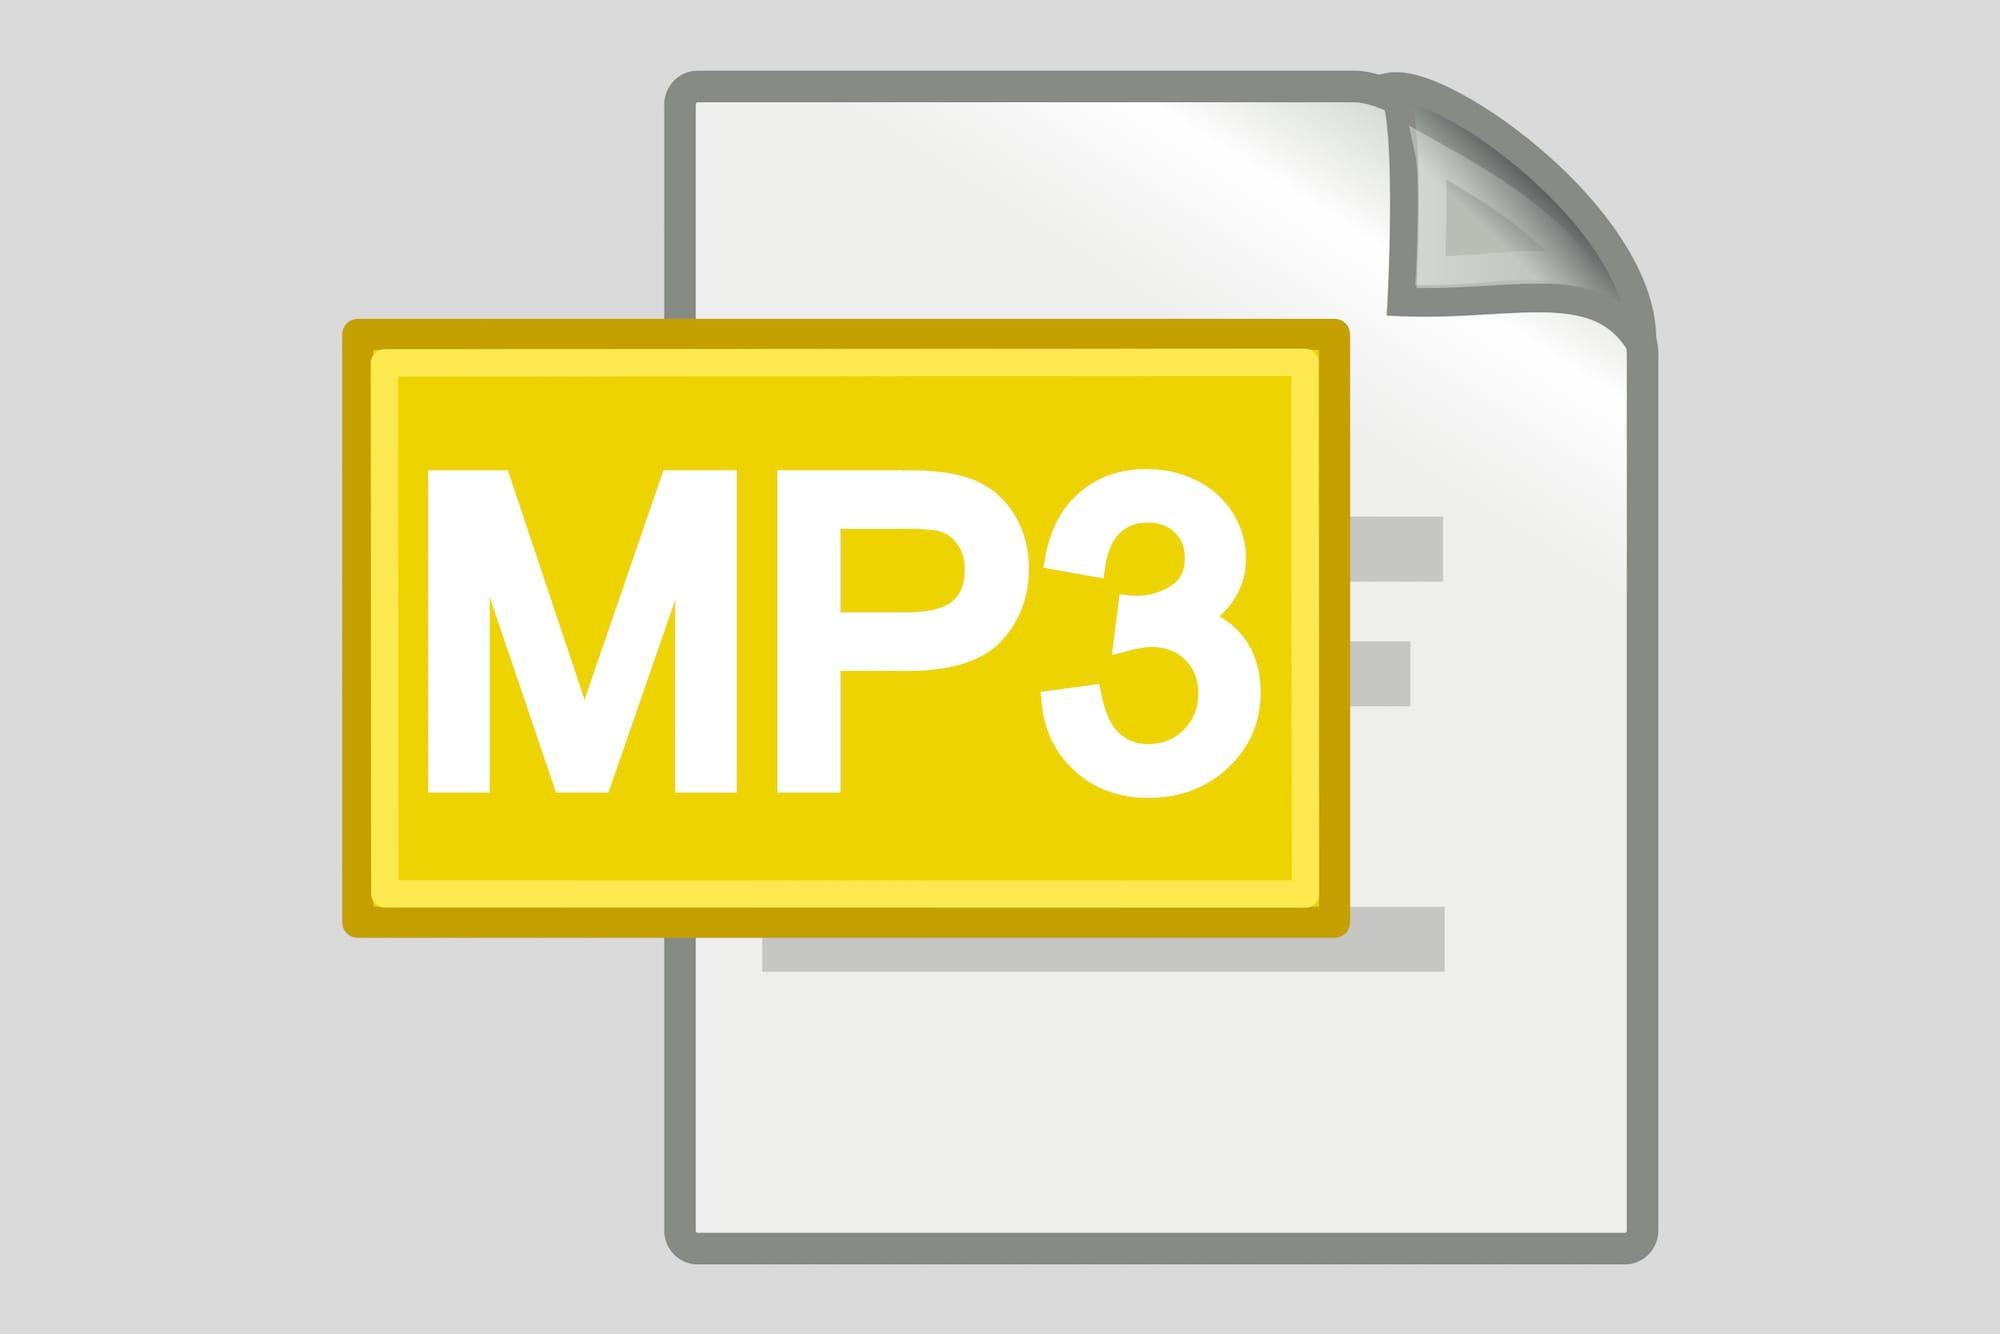 Создатели объявили о«смерти» формата mp3